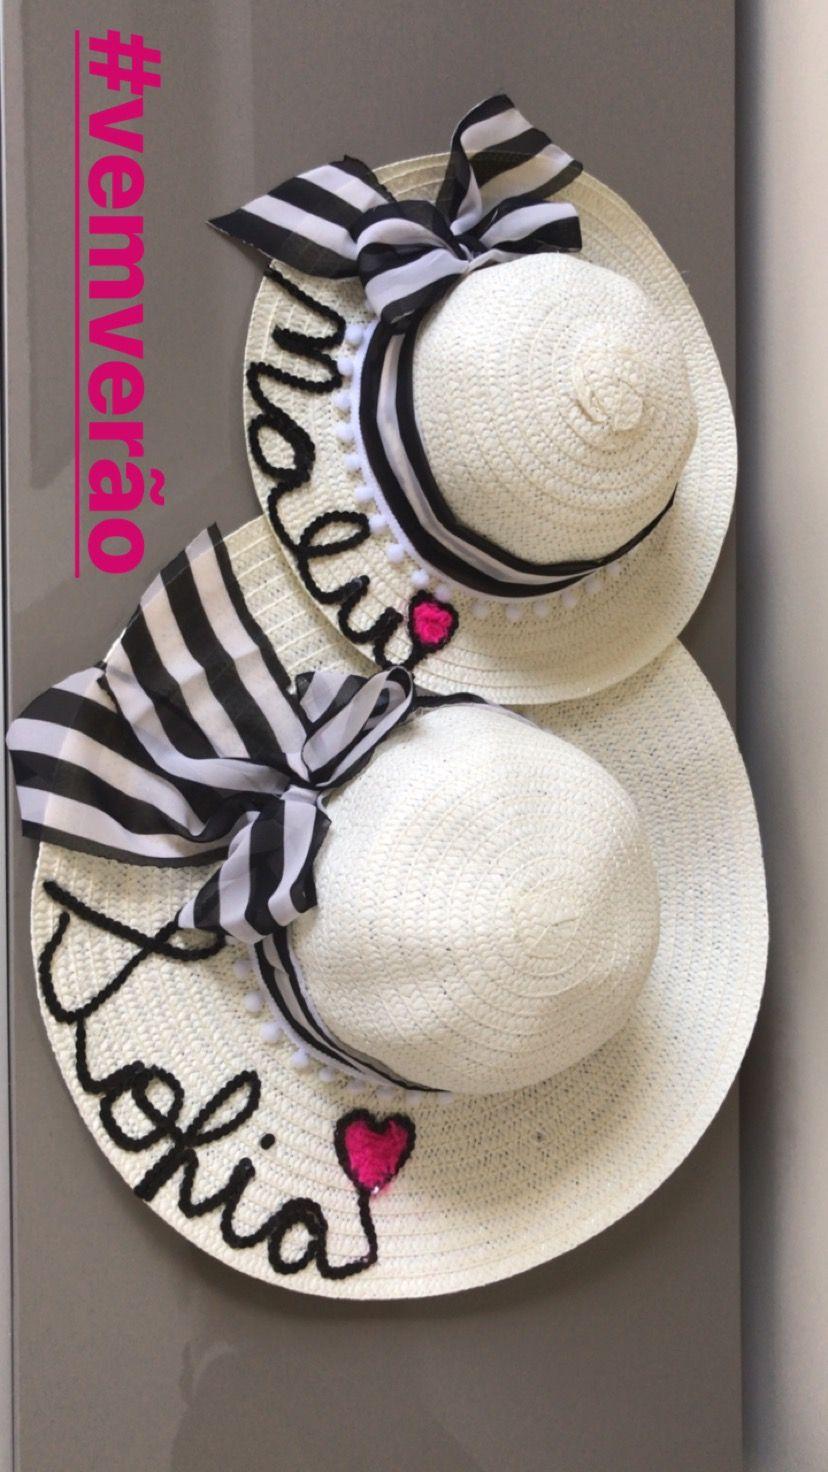 Chapéu de praia personalizado   Sandalias decoradas   Pinterest ... 031260aac6